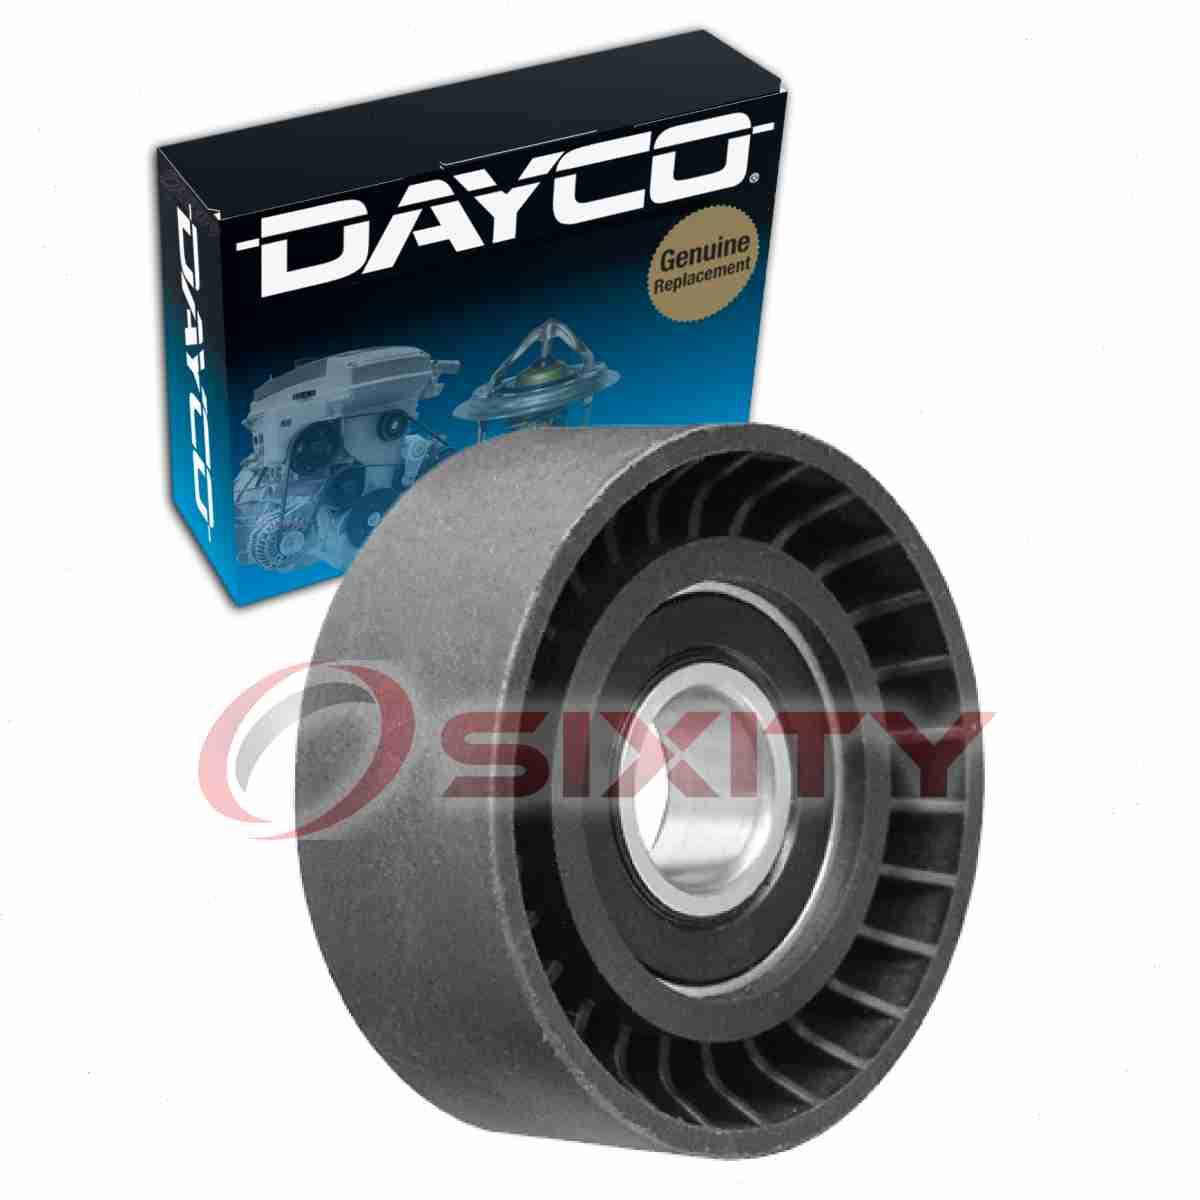 Dayco Drive Belt Tensioner Pulley for 2002-2015 Honda Civic 2.0L 2.4L L4 hg